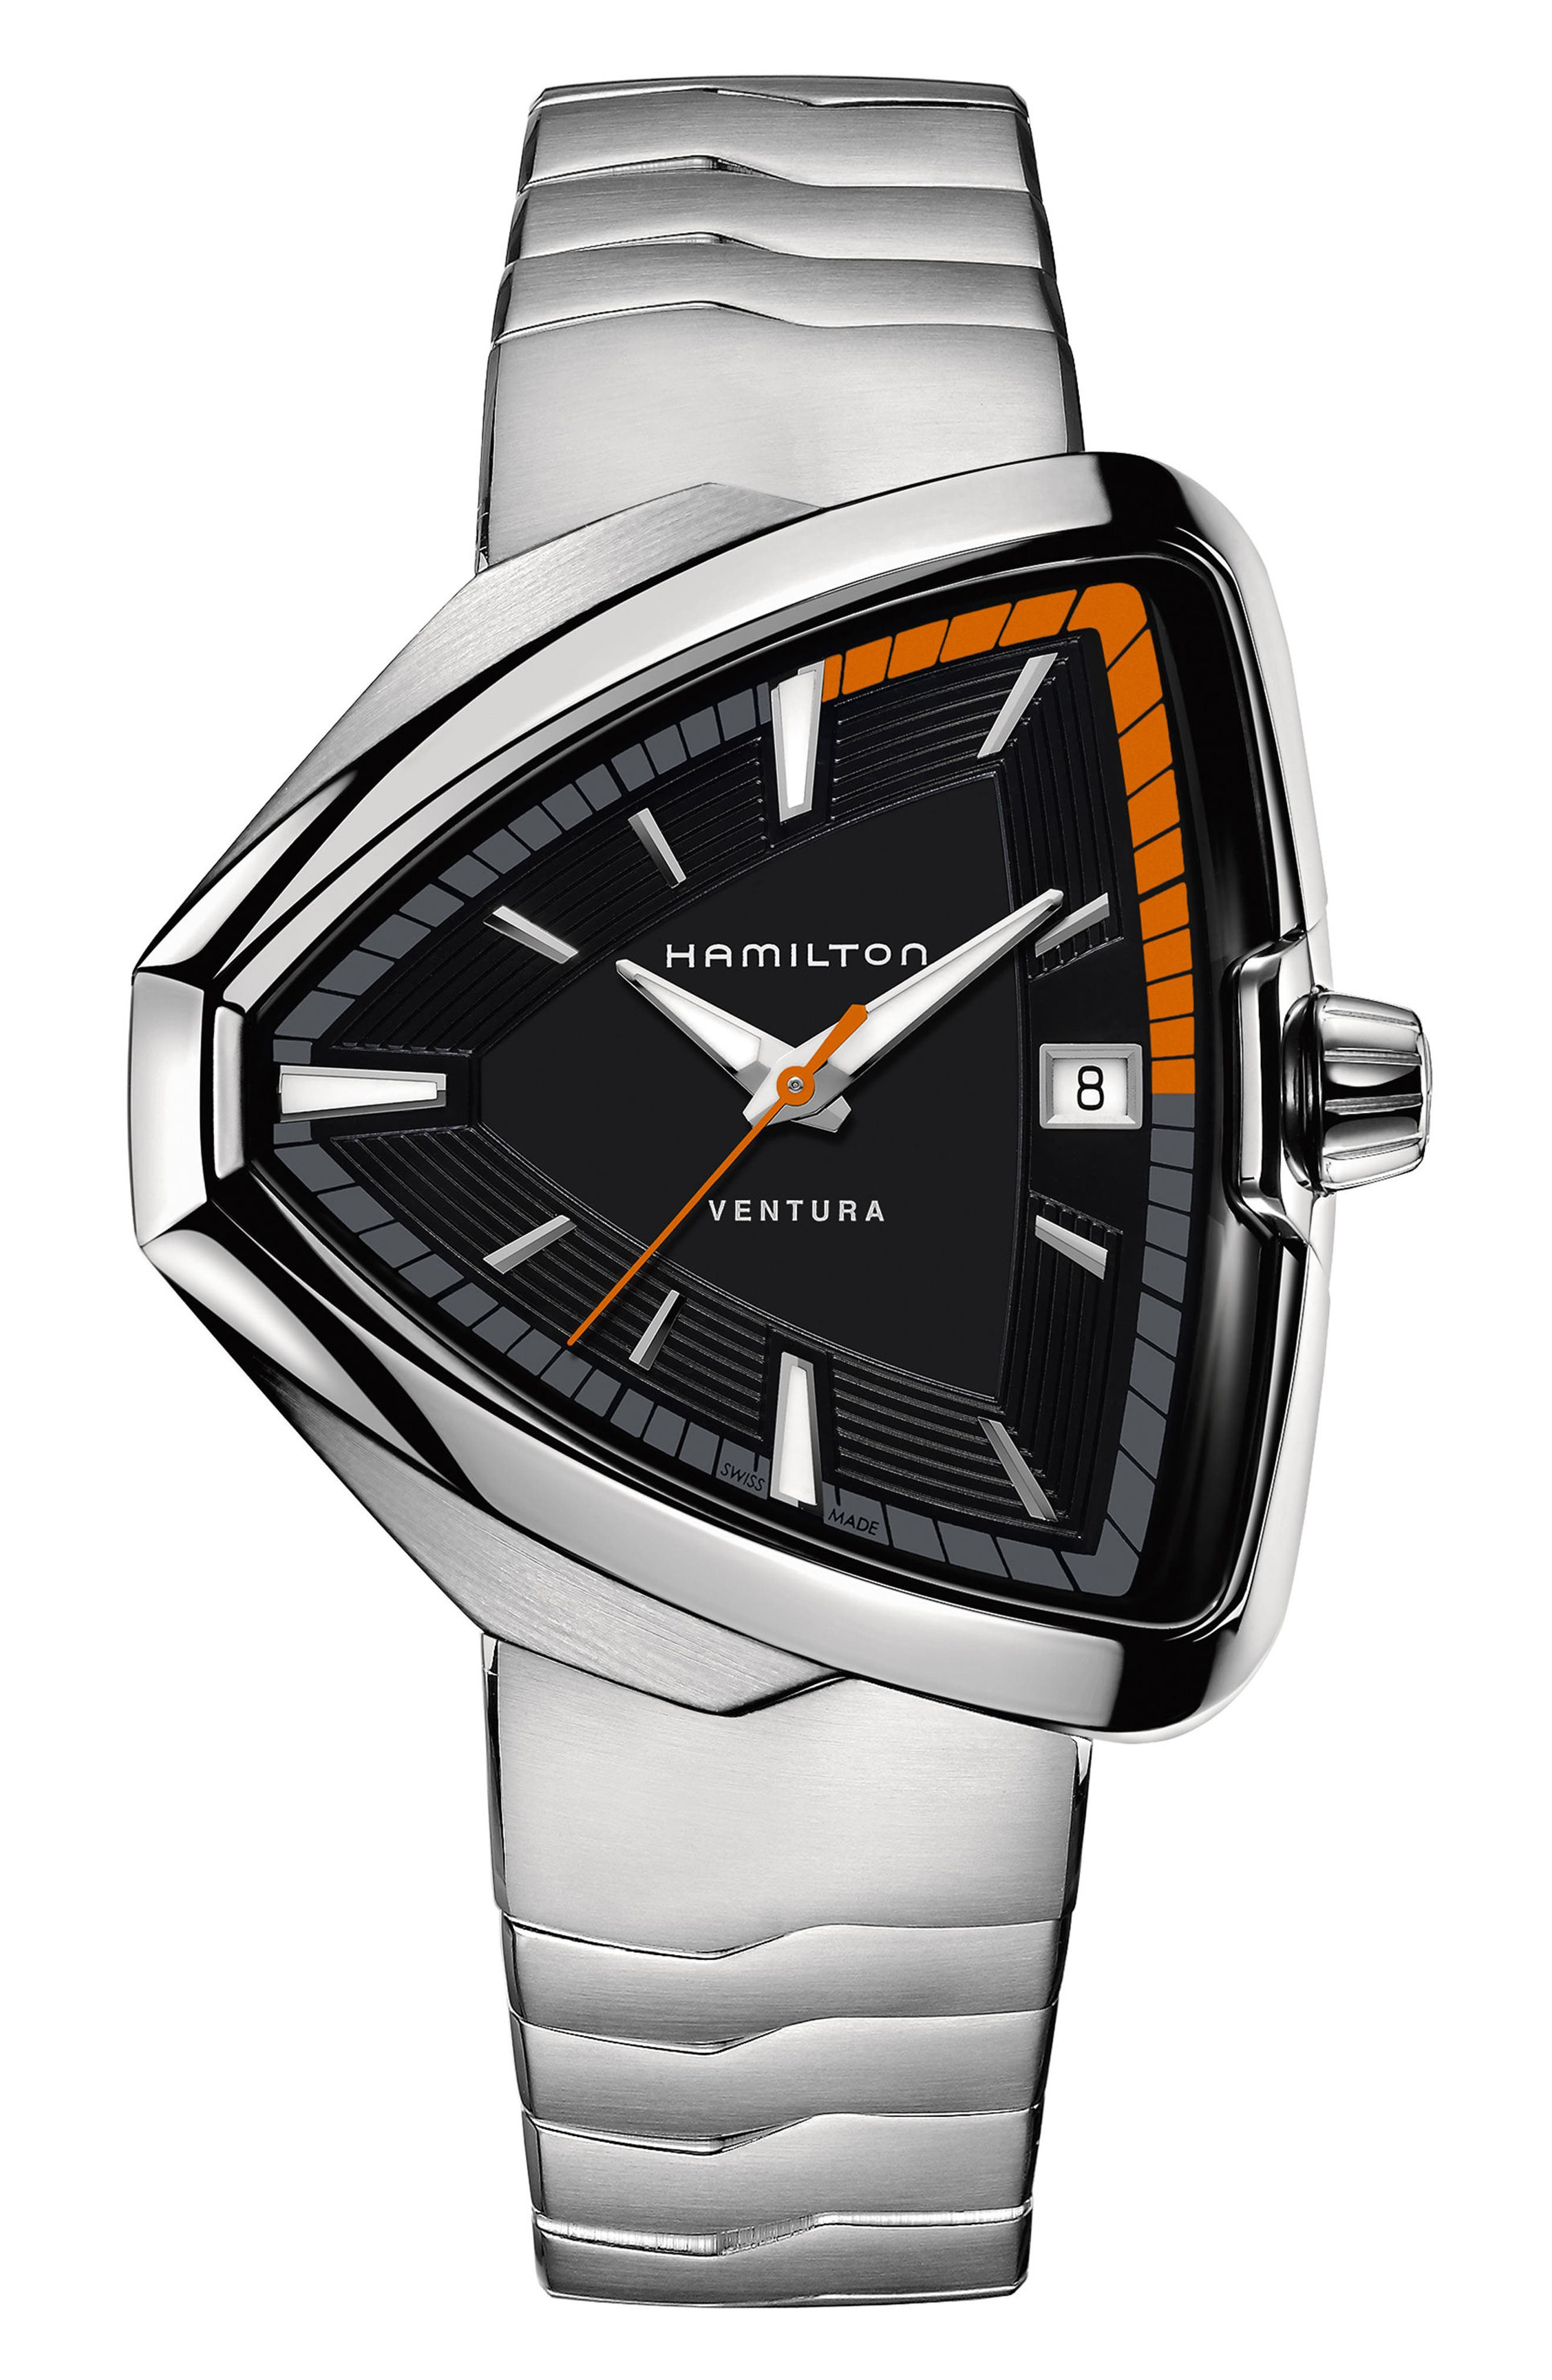 Main Image - Hamilton Ventura Elvis80 Bracelet Watch, 42.5mm x 44.5mm